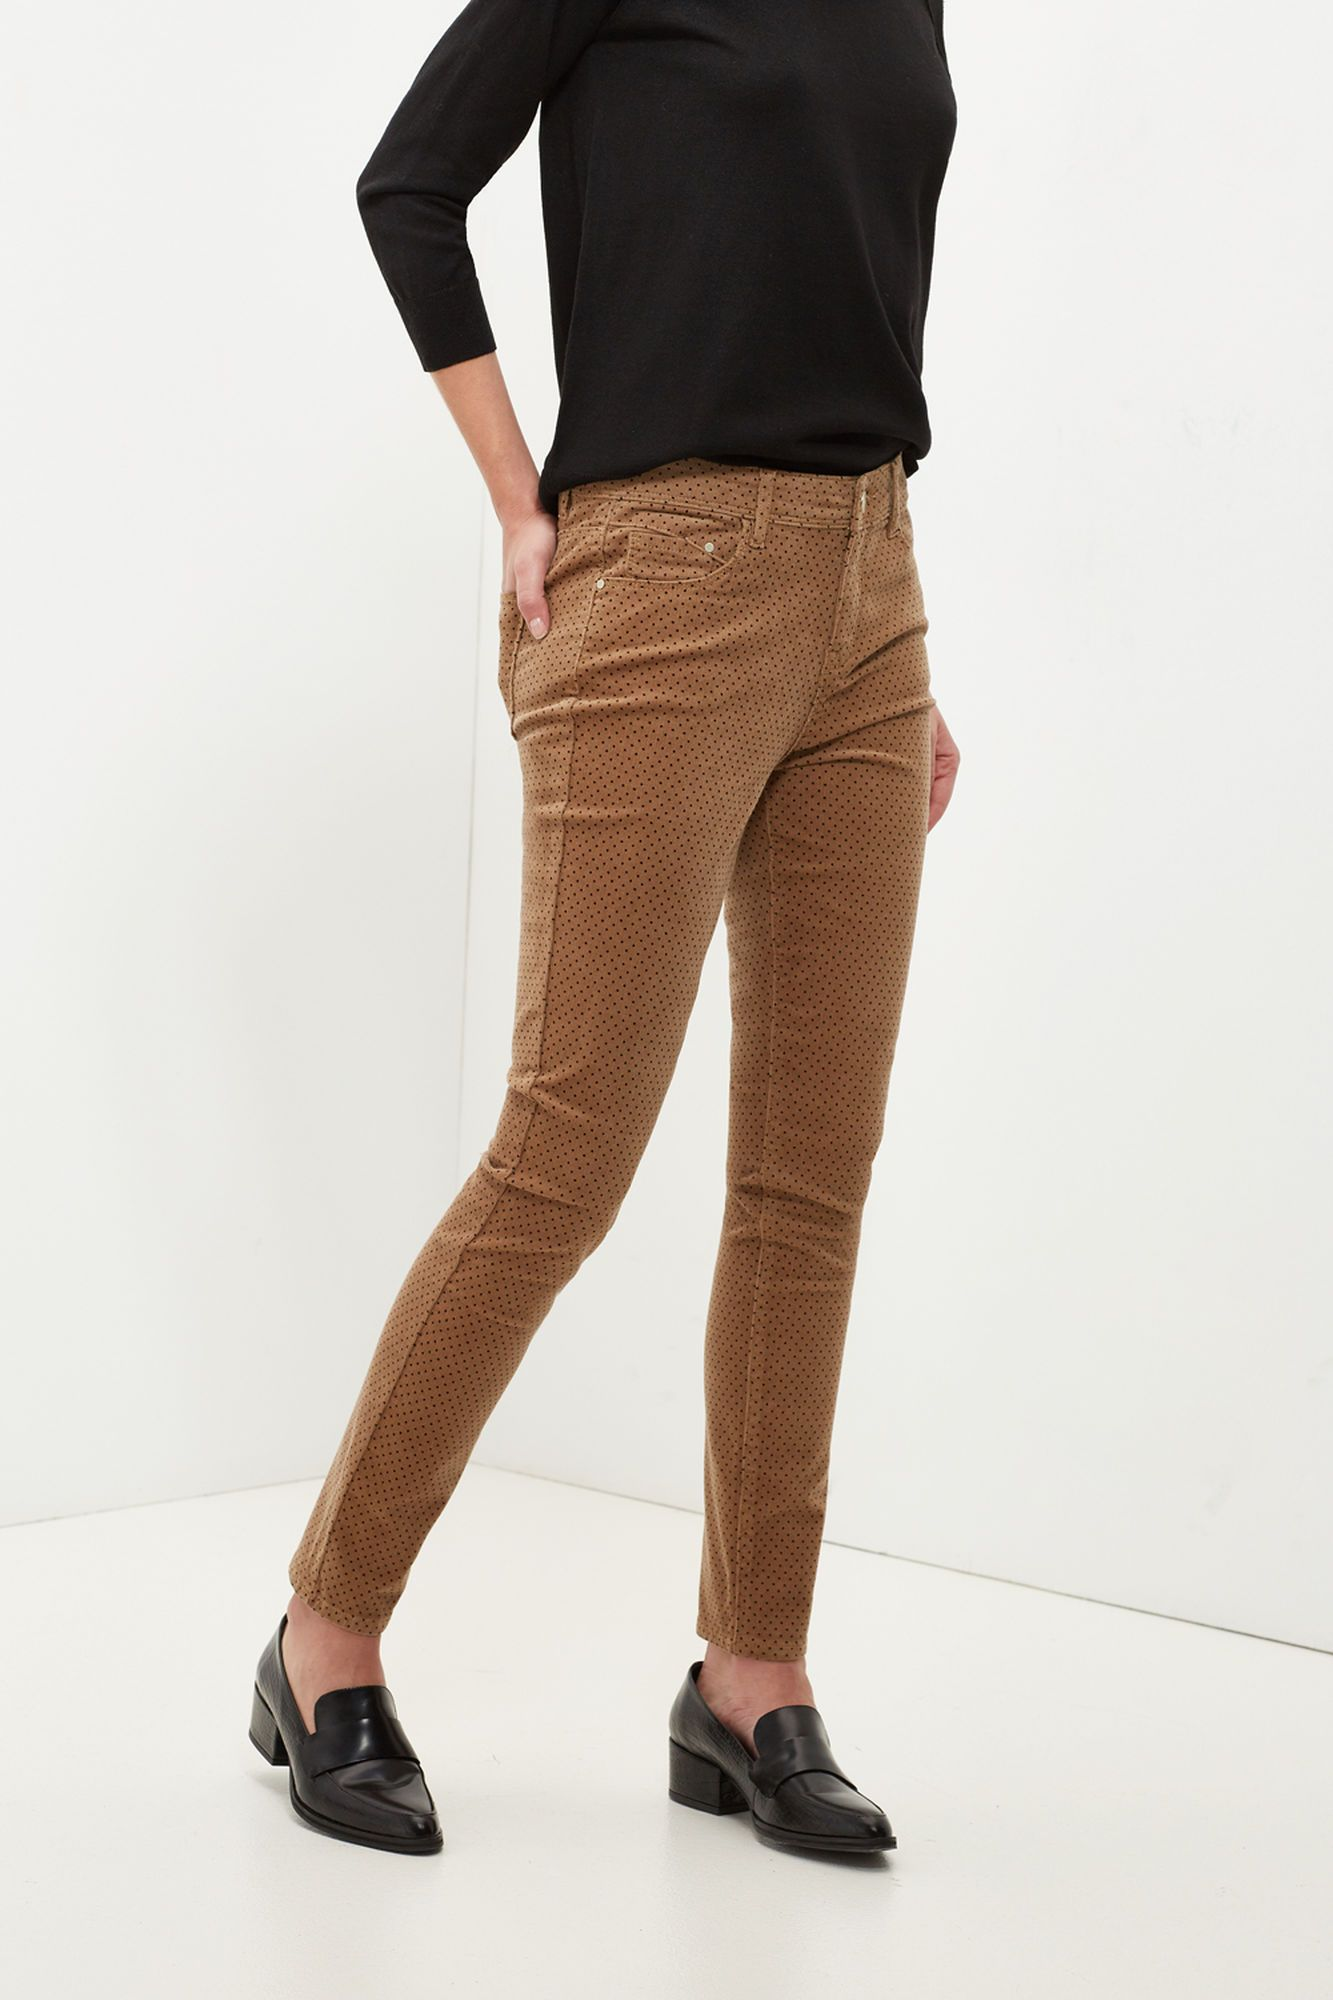 Pantalon Skinny De Pana Pantalones Cortefiel Pantalones De Pana Pantalones Ropa